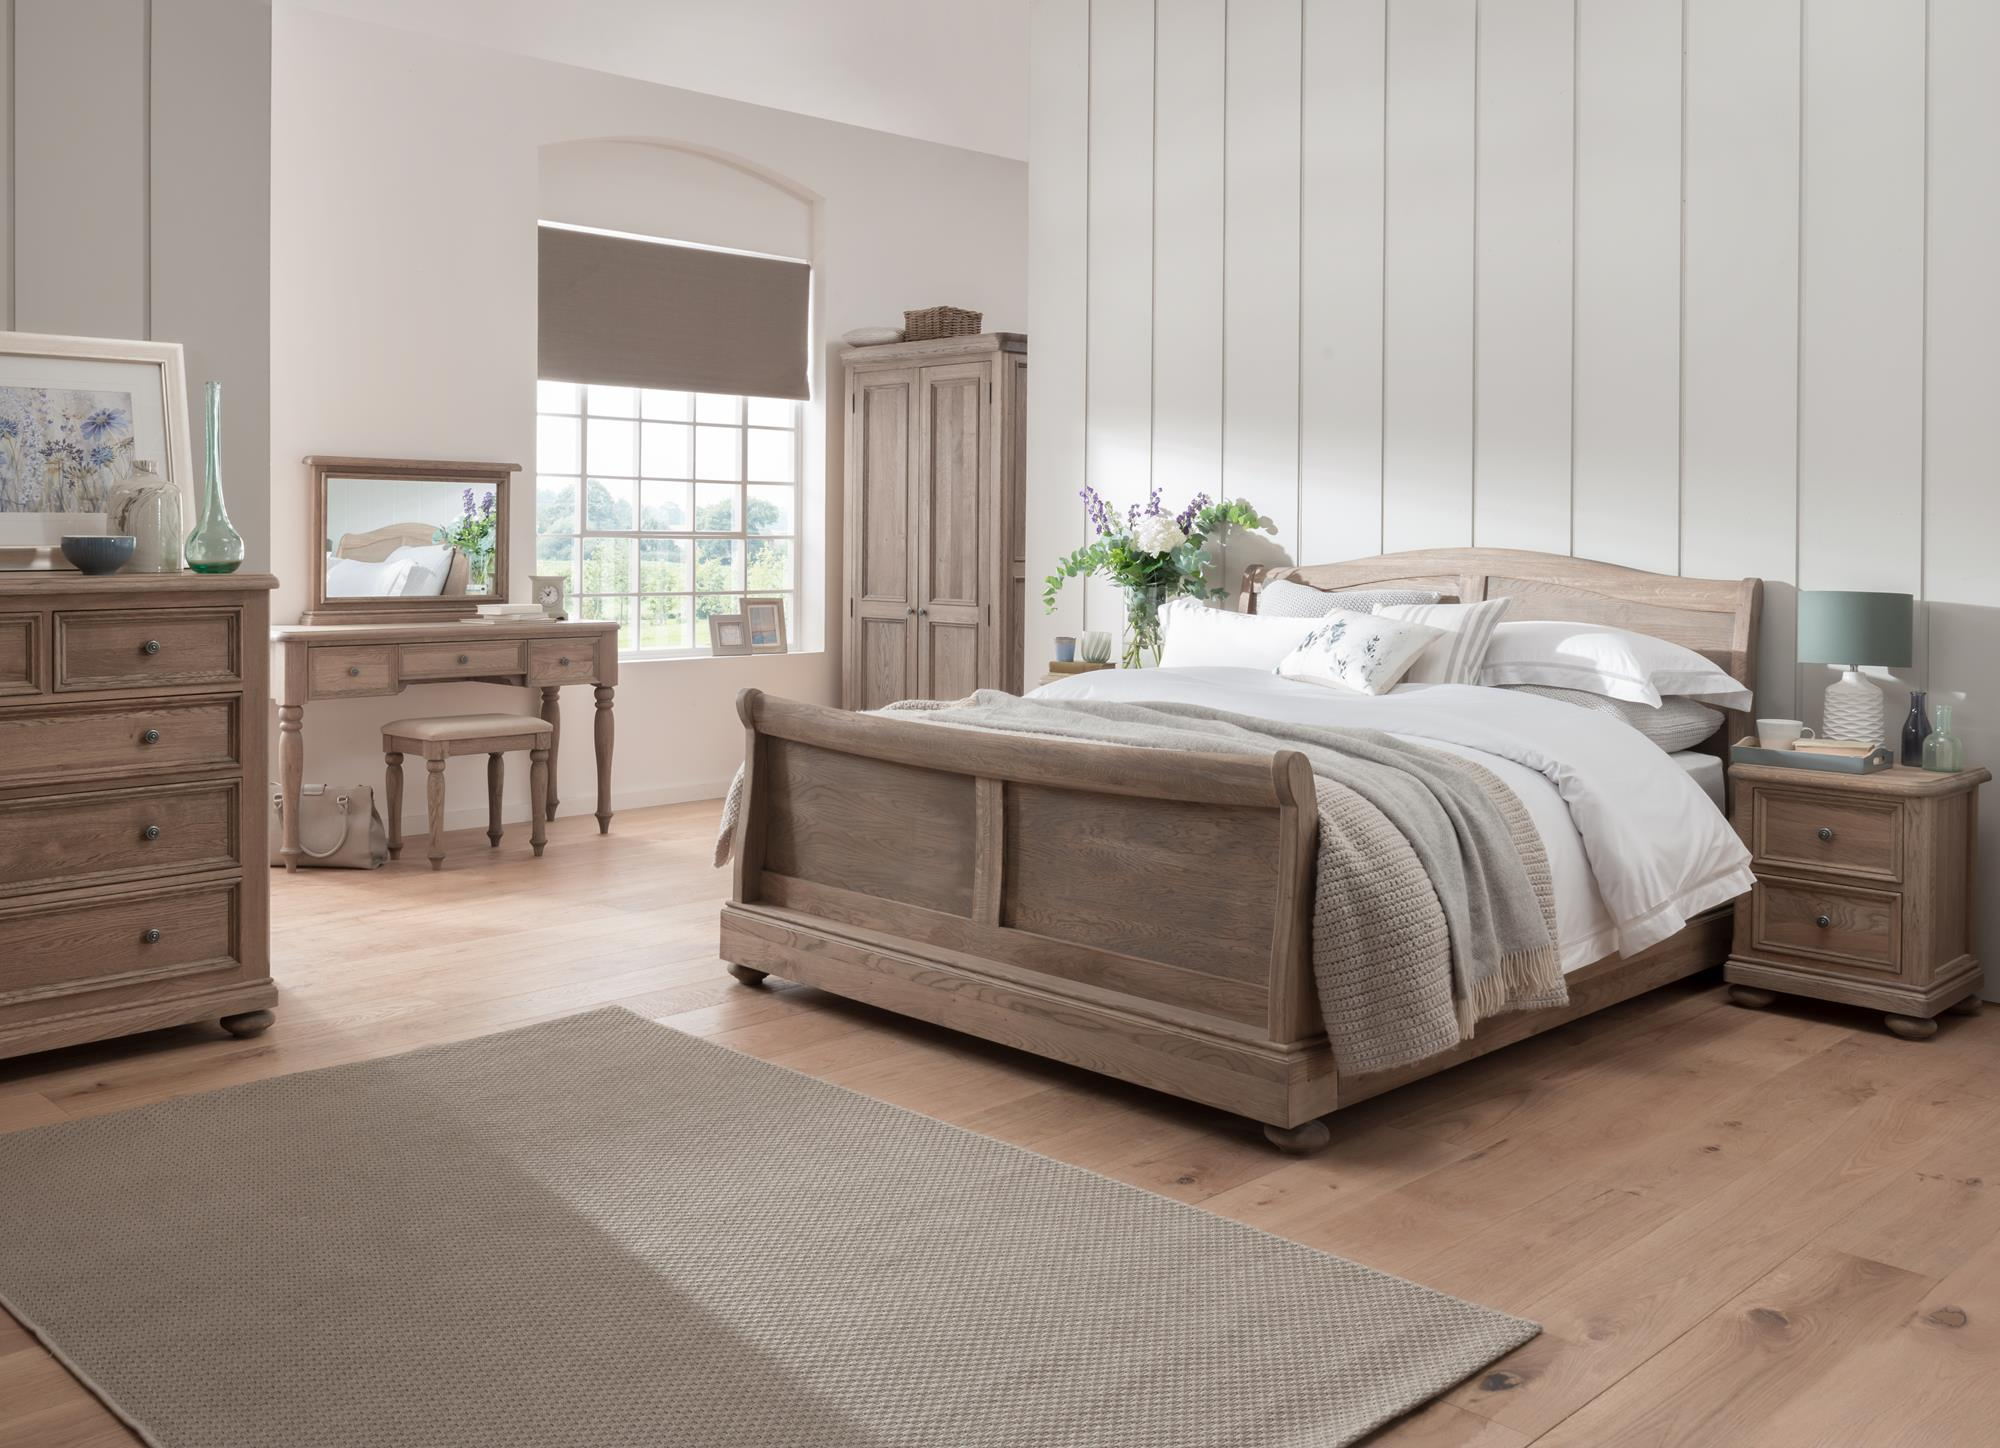 Dropship Furniture Suppliers Uk